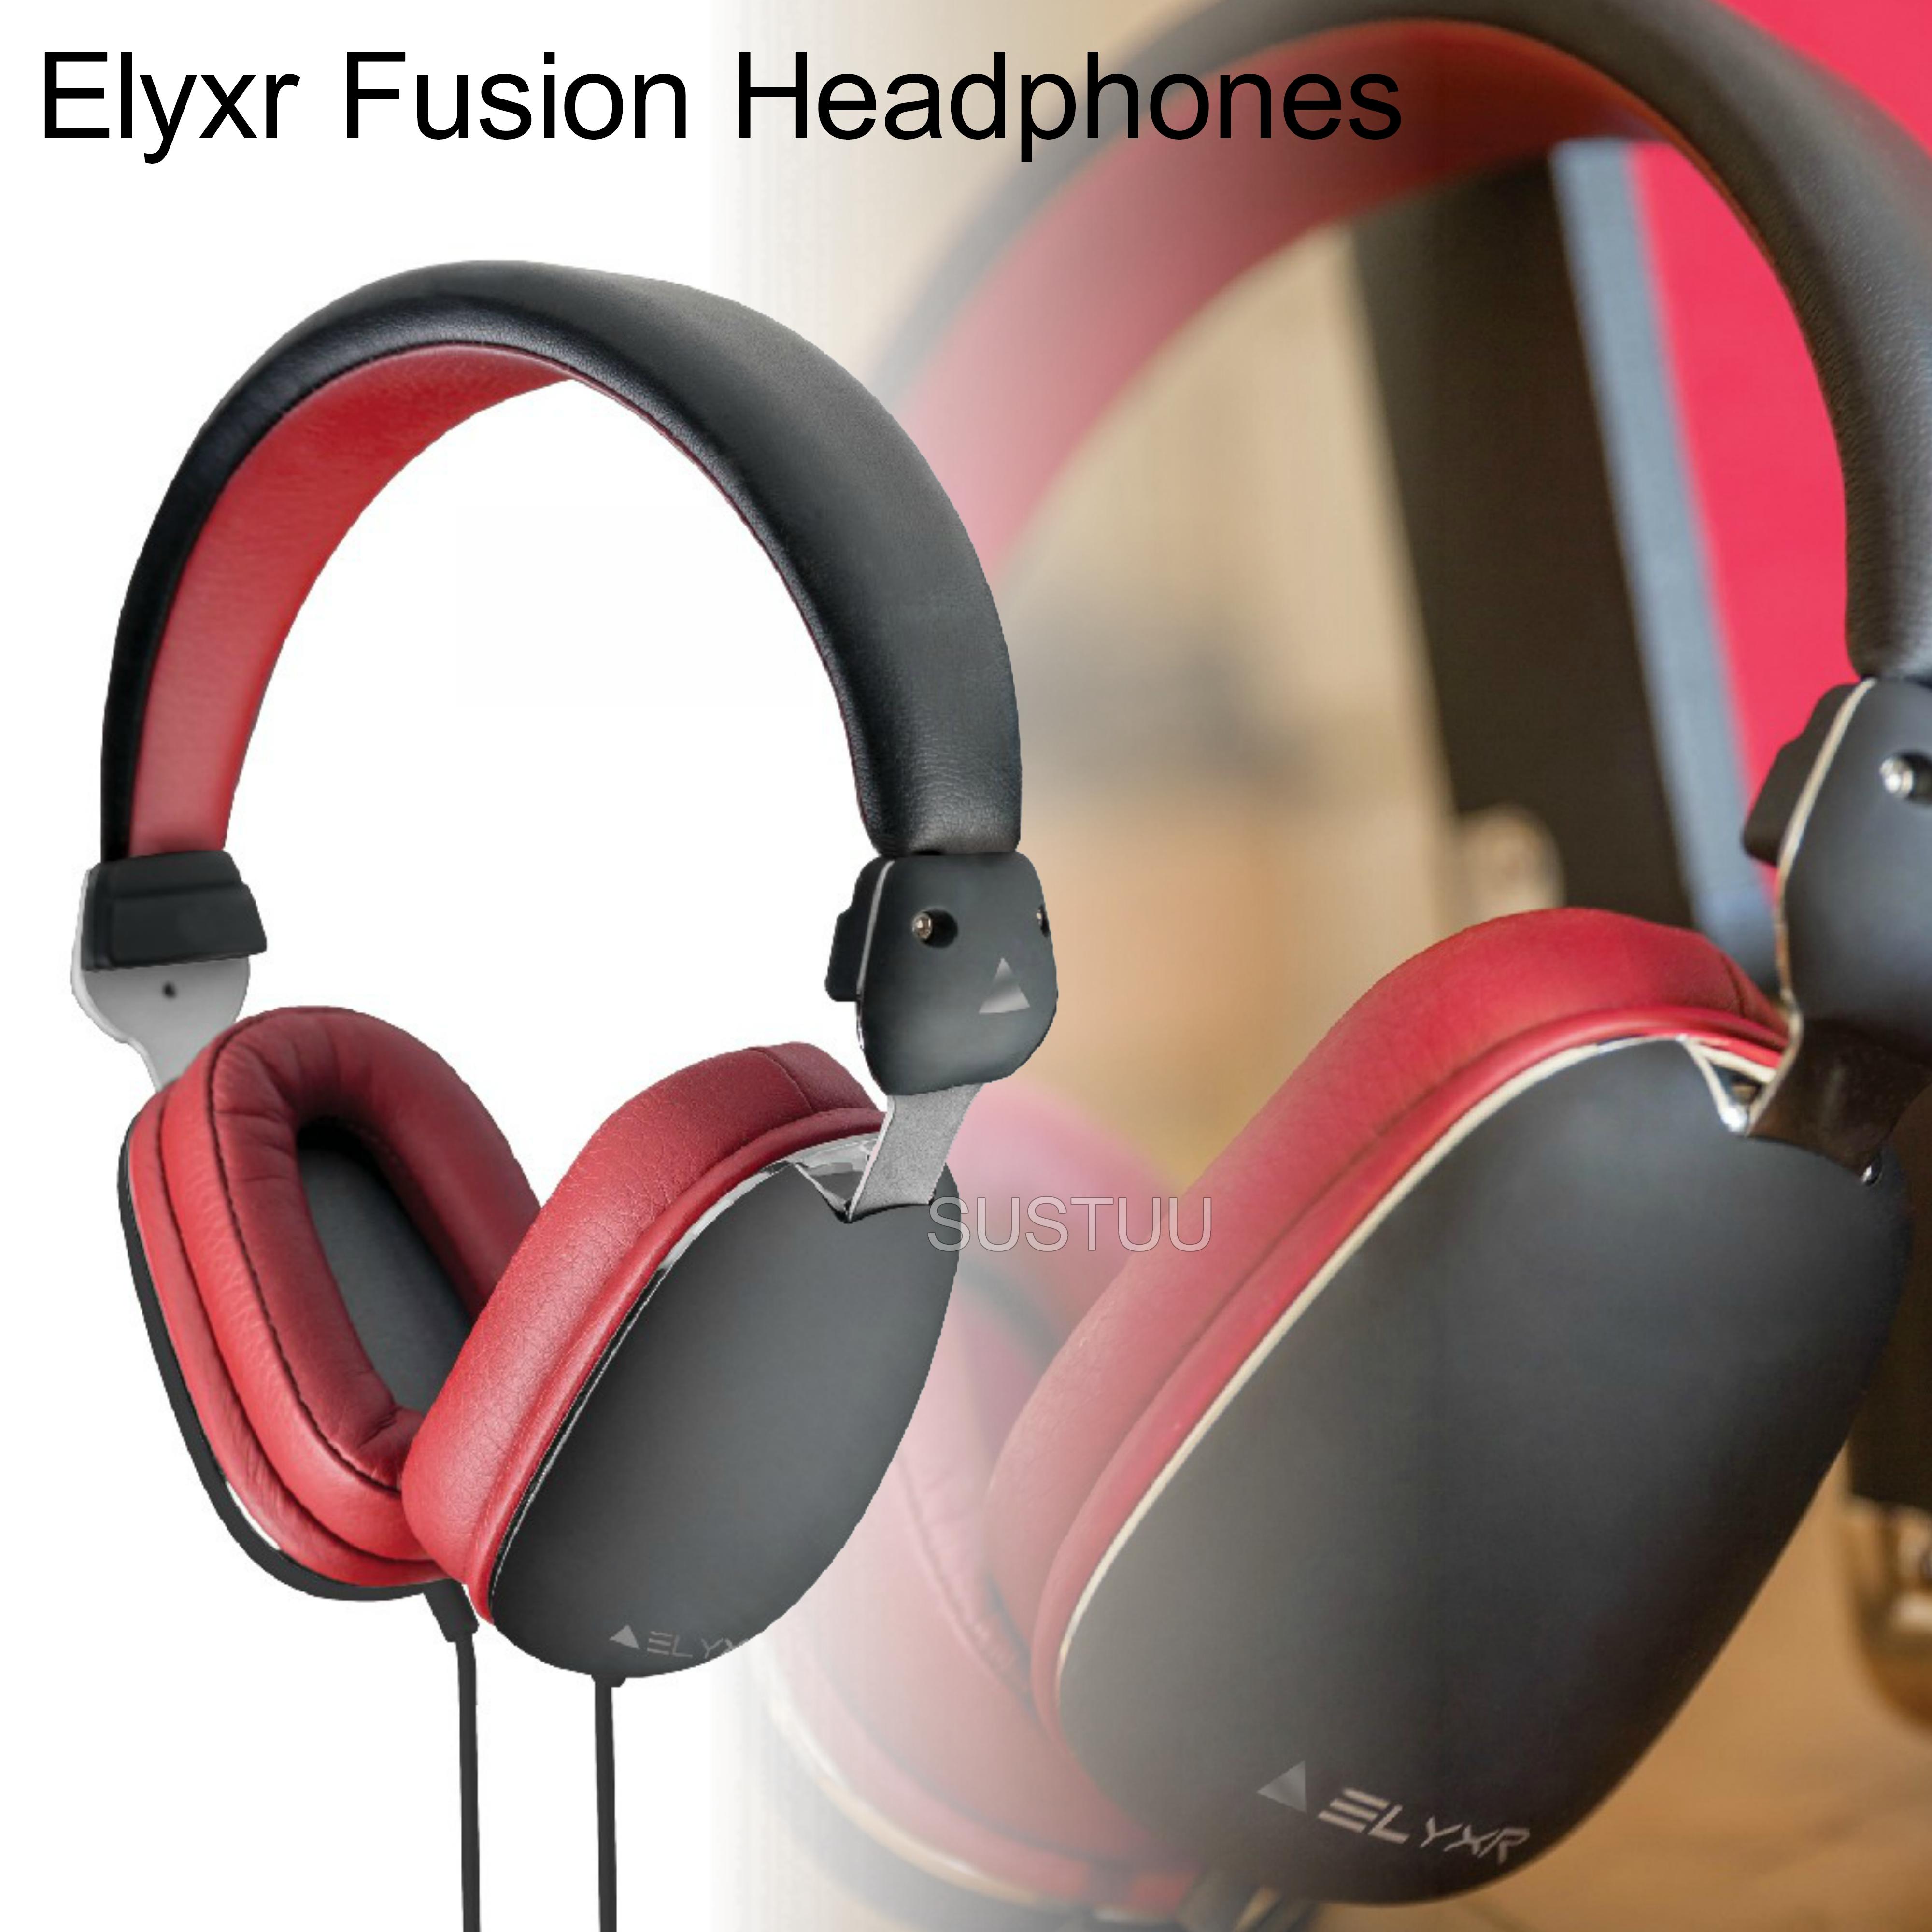 Elyxr Audio ELX-1005 Fusion On-Ear Wired Headphones|Dynamic Audio|Black and Burgandy